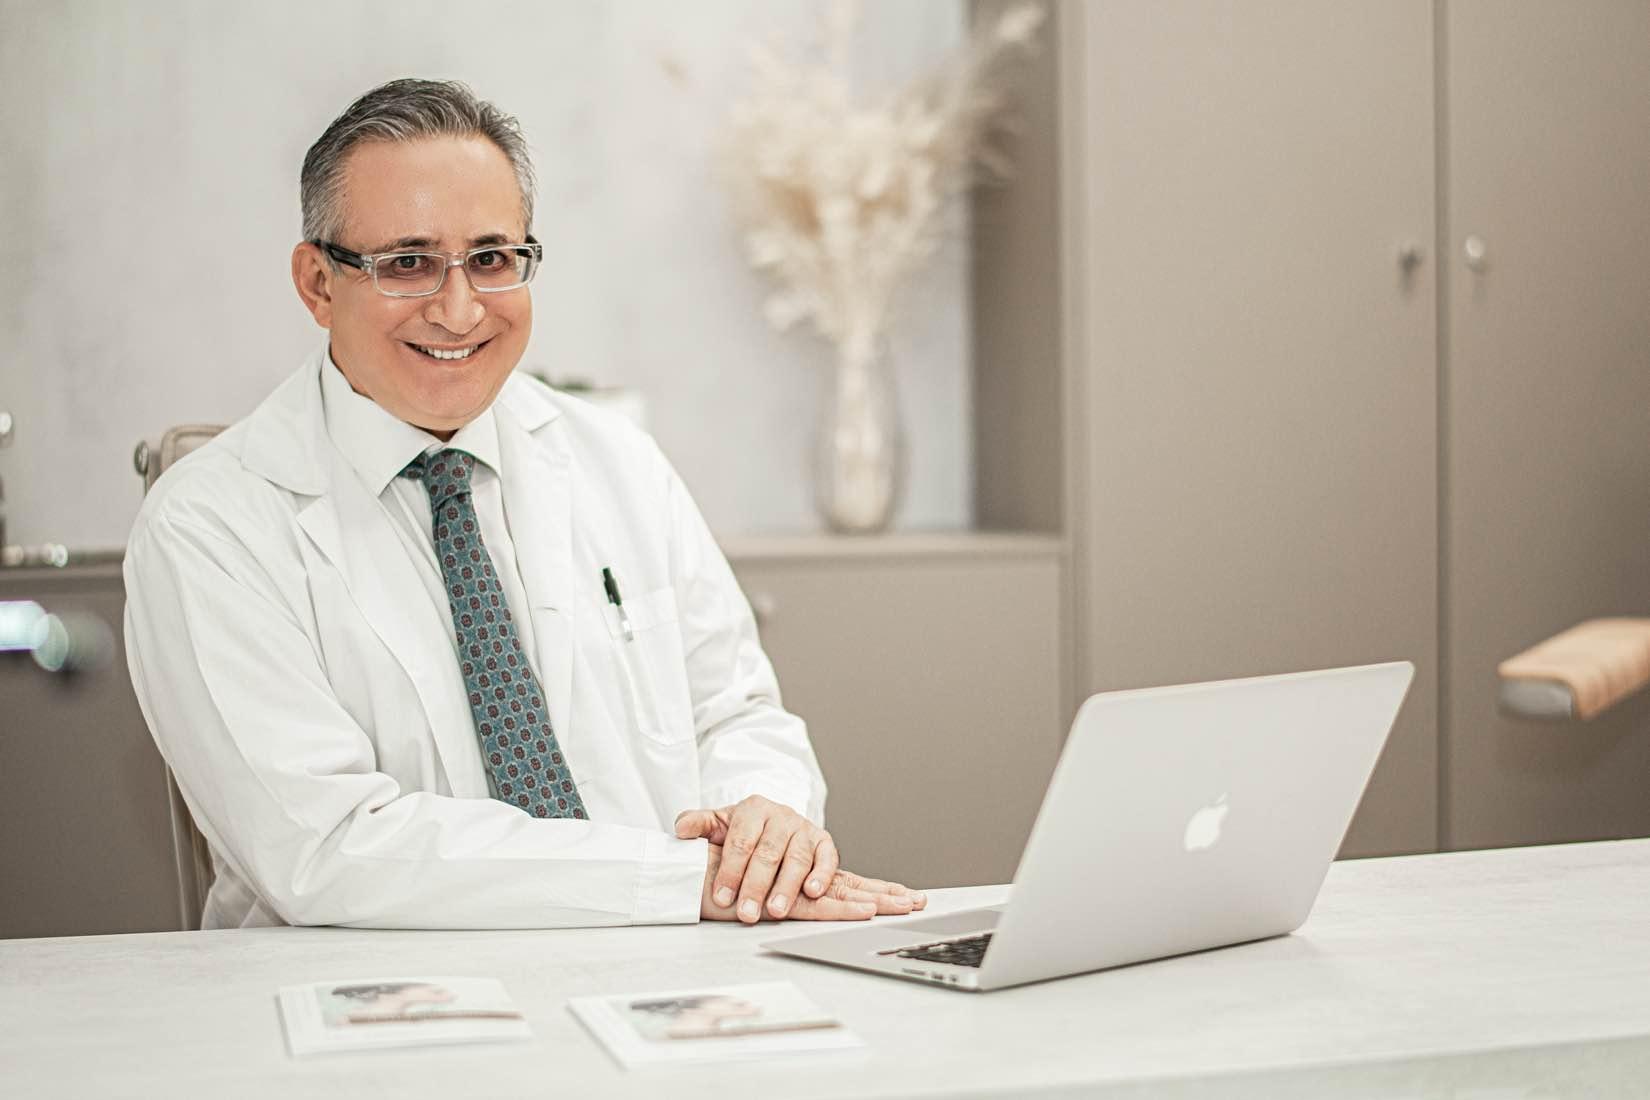 Dr. Konstantinos Pilichos - FineSkin - Ästhetische Chirurgie - Augenlidstraffung - Brustvergrösserung – Fettabsaugung - 3D Simulation (Beratung) - Ästhetische Dermatologie - Hyaluron - Muskelrelaxans - Fettwegspritze - Fadenlifting - PRP Vampire Lifting - TCA-Peeling - Medizinische Kosmetik (Gesicht) - Observer-Hautanalyse - HydraFacial - Mesotherapie - QuadroStar - Secret RF Microneedling - Diodenlaser MeDioStar - IS Clinical Fire & Ice - Chemische Peelings - Fruchtsäurepeeling -ICOONE Laser - Seyo TDA Beautysystem -Ultraschallbehandlung - BB Glow Microneedling - Klassiche Gesichtsbehandlung - Medizinische Kosmetik (Körper) - Kryolipolyse - ICOONE Laser Body - Secret RF Microneedling Body - Dauerhafte Haarentfernung - VIP Line Elektrotherapie Body - Methode Brigitte Kettner - iS Clinical - Aesthetico - IMAGE Skincare - Beauty Secrets